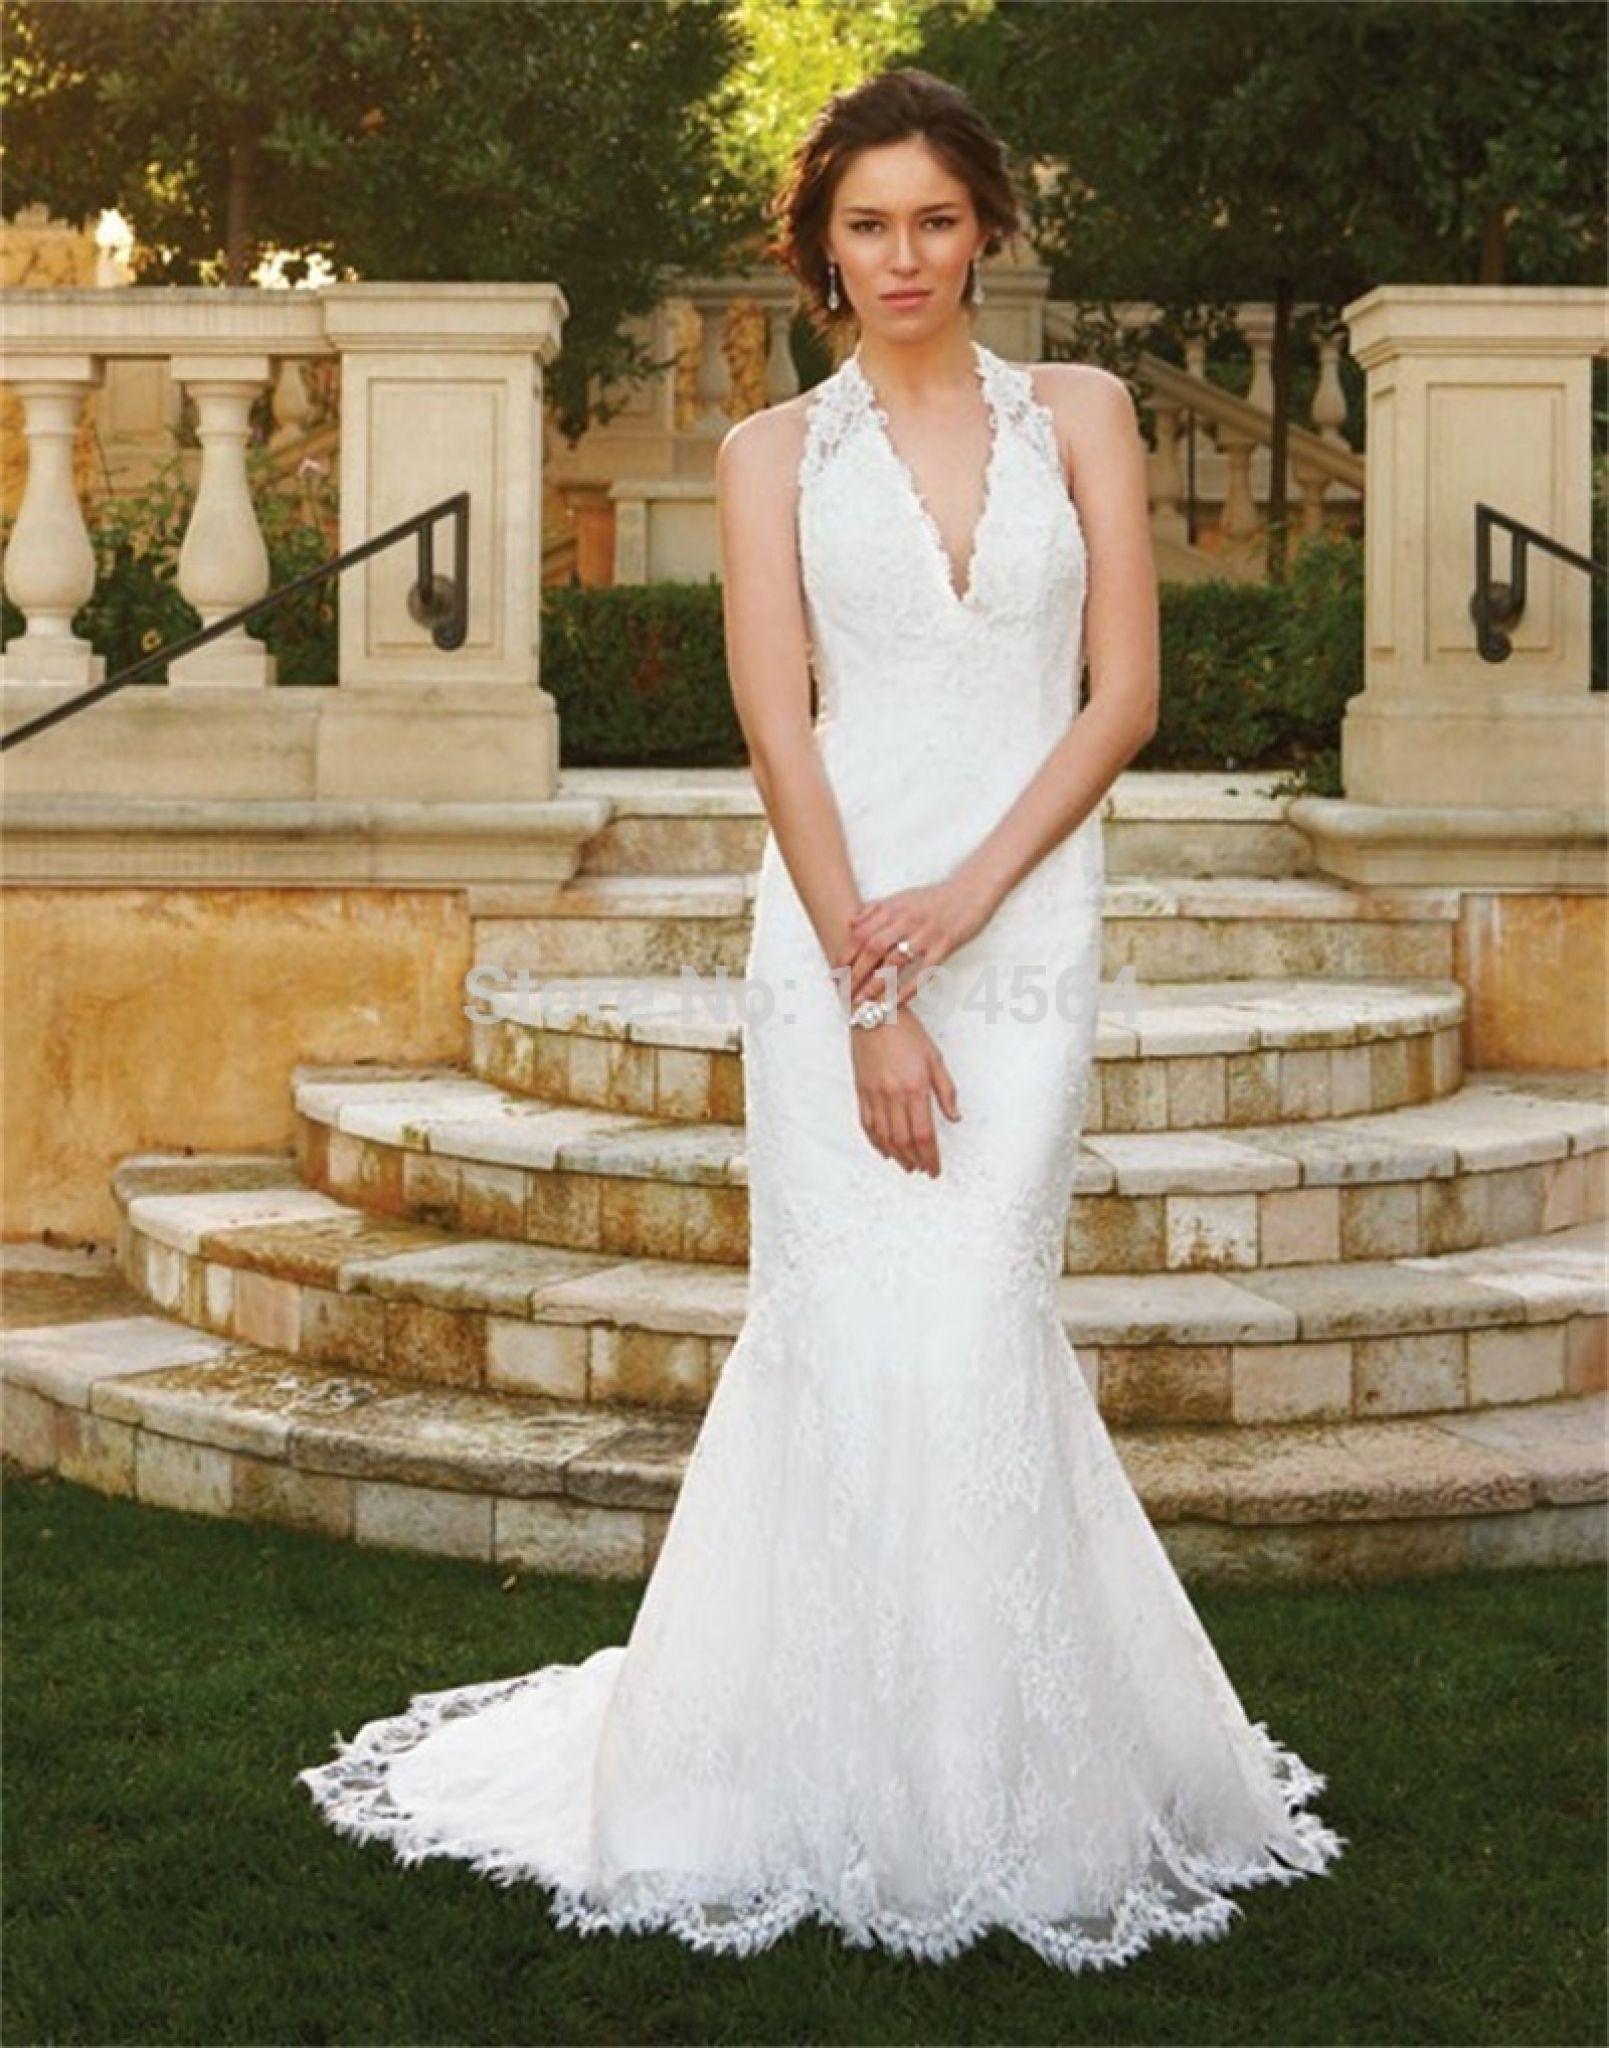 Halter neck backless wedding dress plus size dresses for wedding